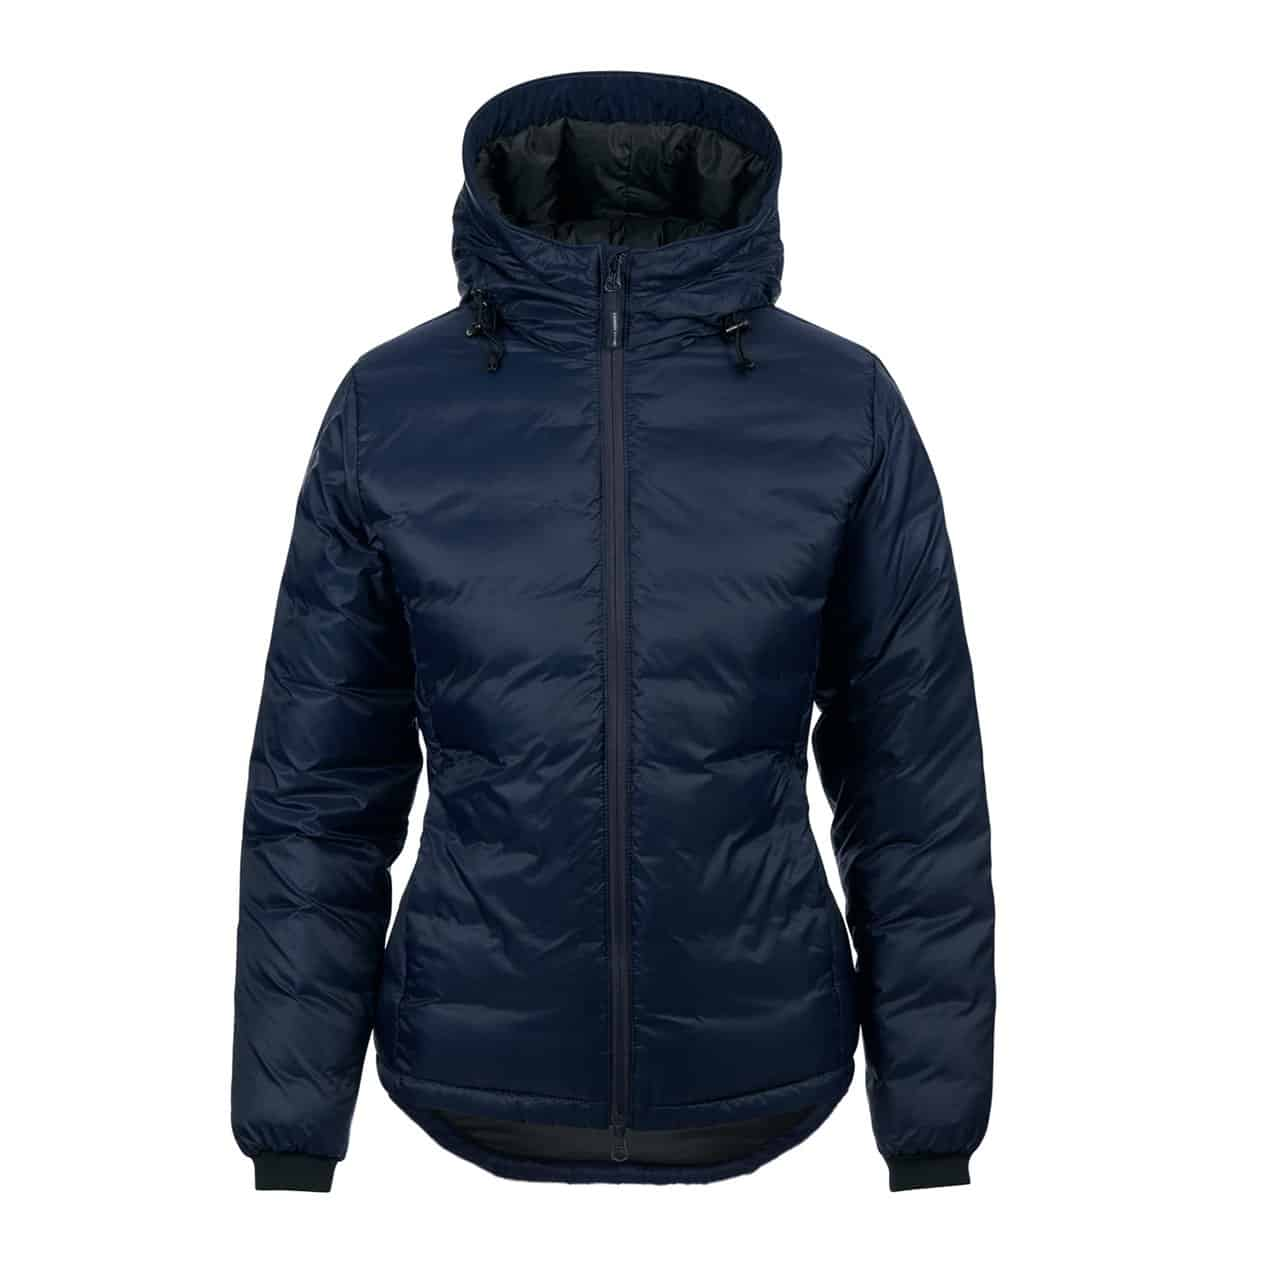 767146540f0 Women s top light down jackets. 1. Camp Down Hoody